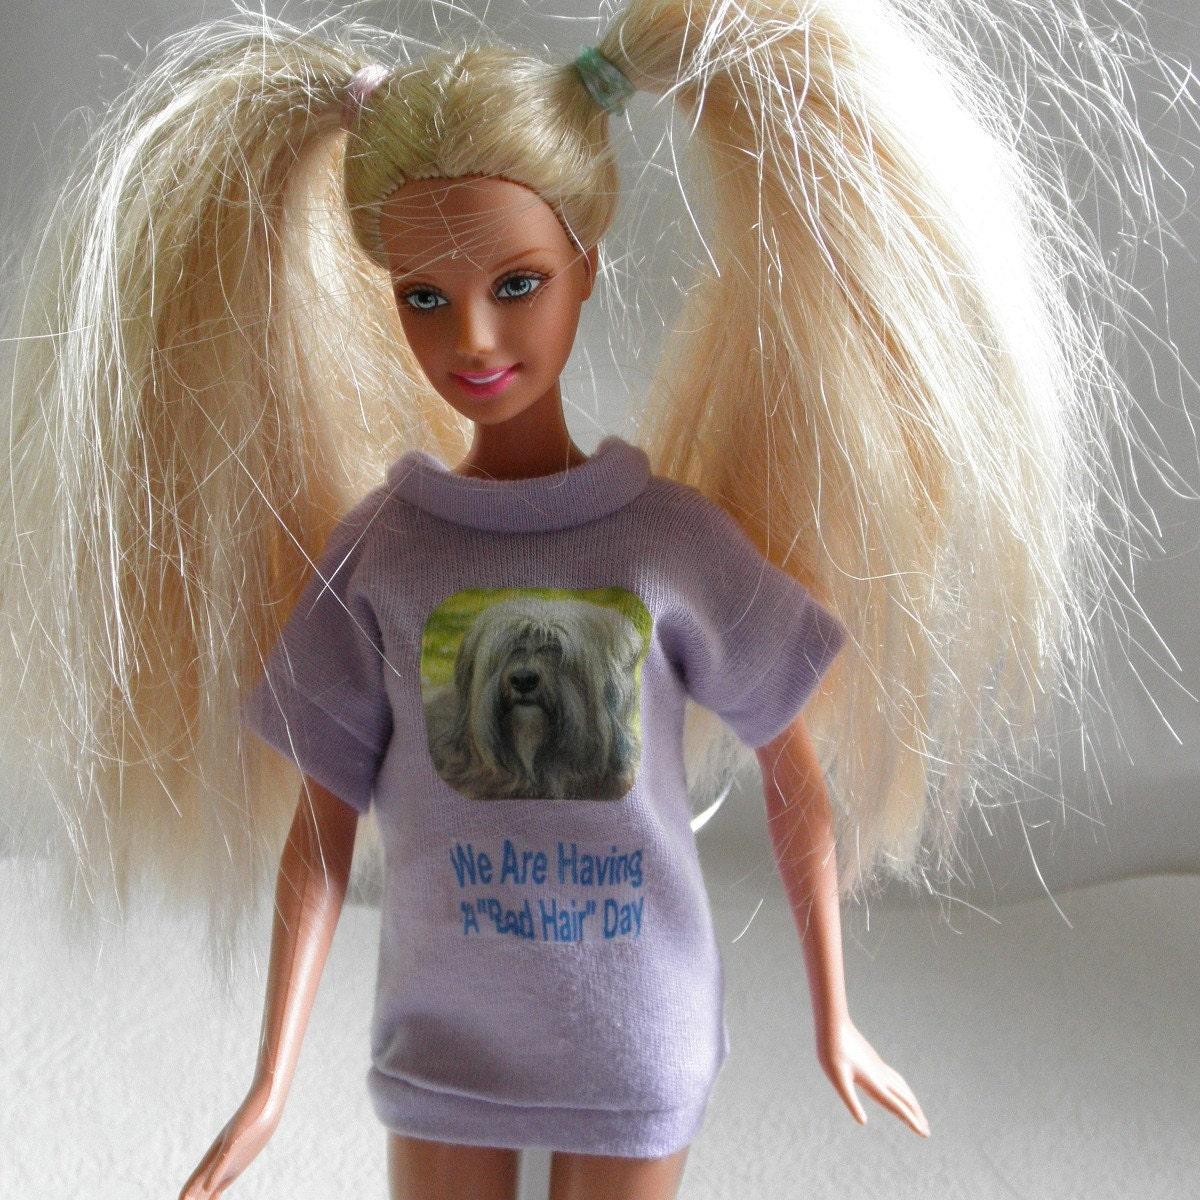 Barbie Bad Hair Day